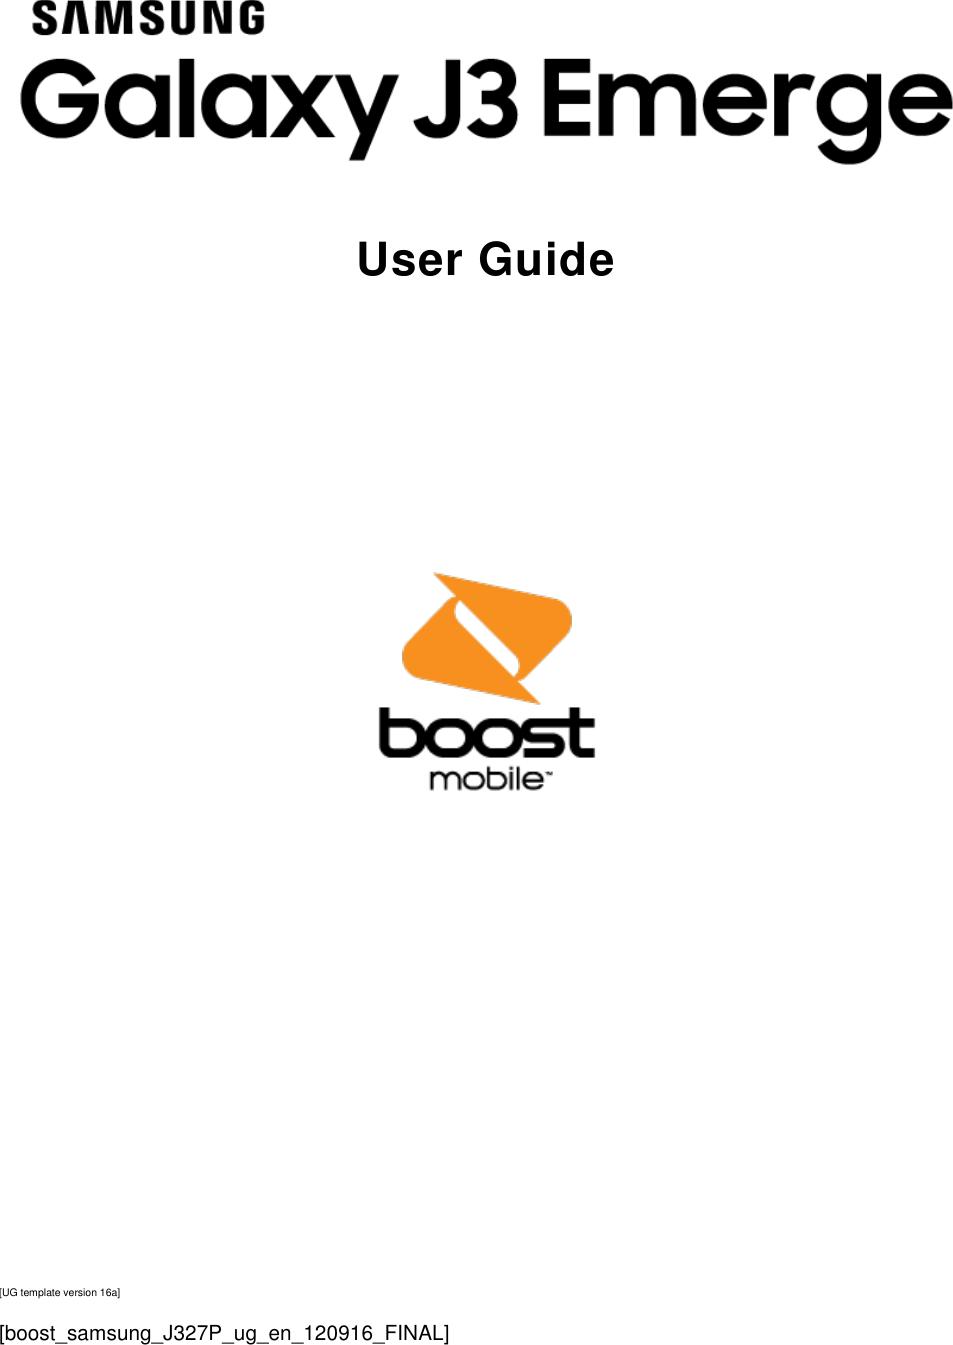 Samsung Galaxy J3 Emerge J327P User Guide Manual BST SM EN